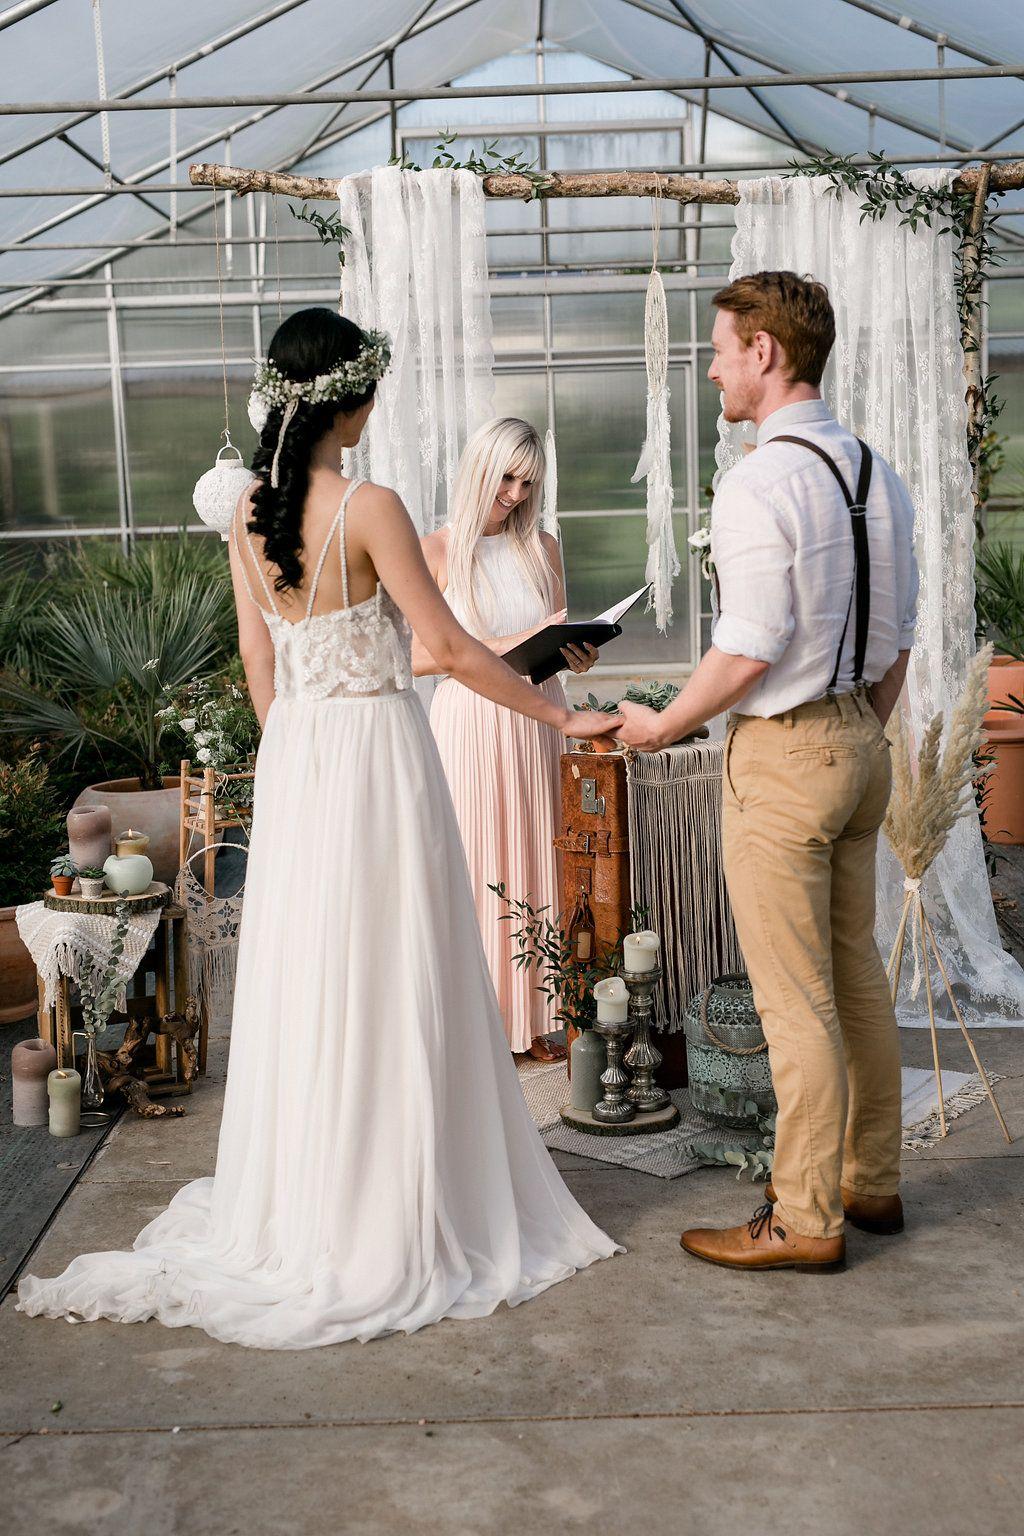 Wild Romance Boho Wedding Weddicted Feelings Wedding Boho Hochzeitsinspirationen Hochzeitskleid Spitze